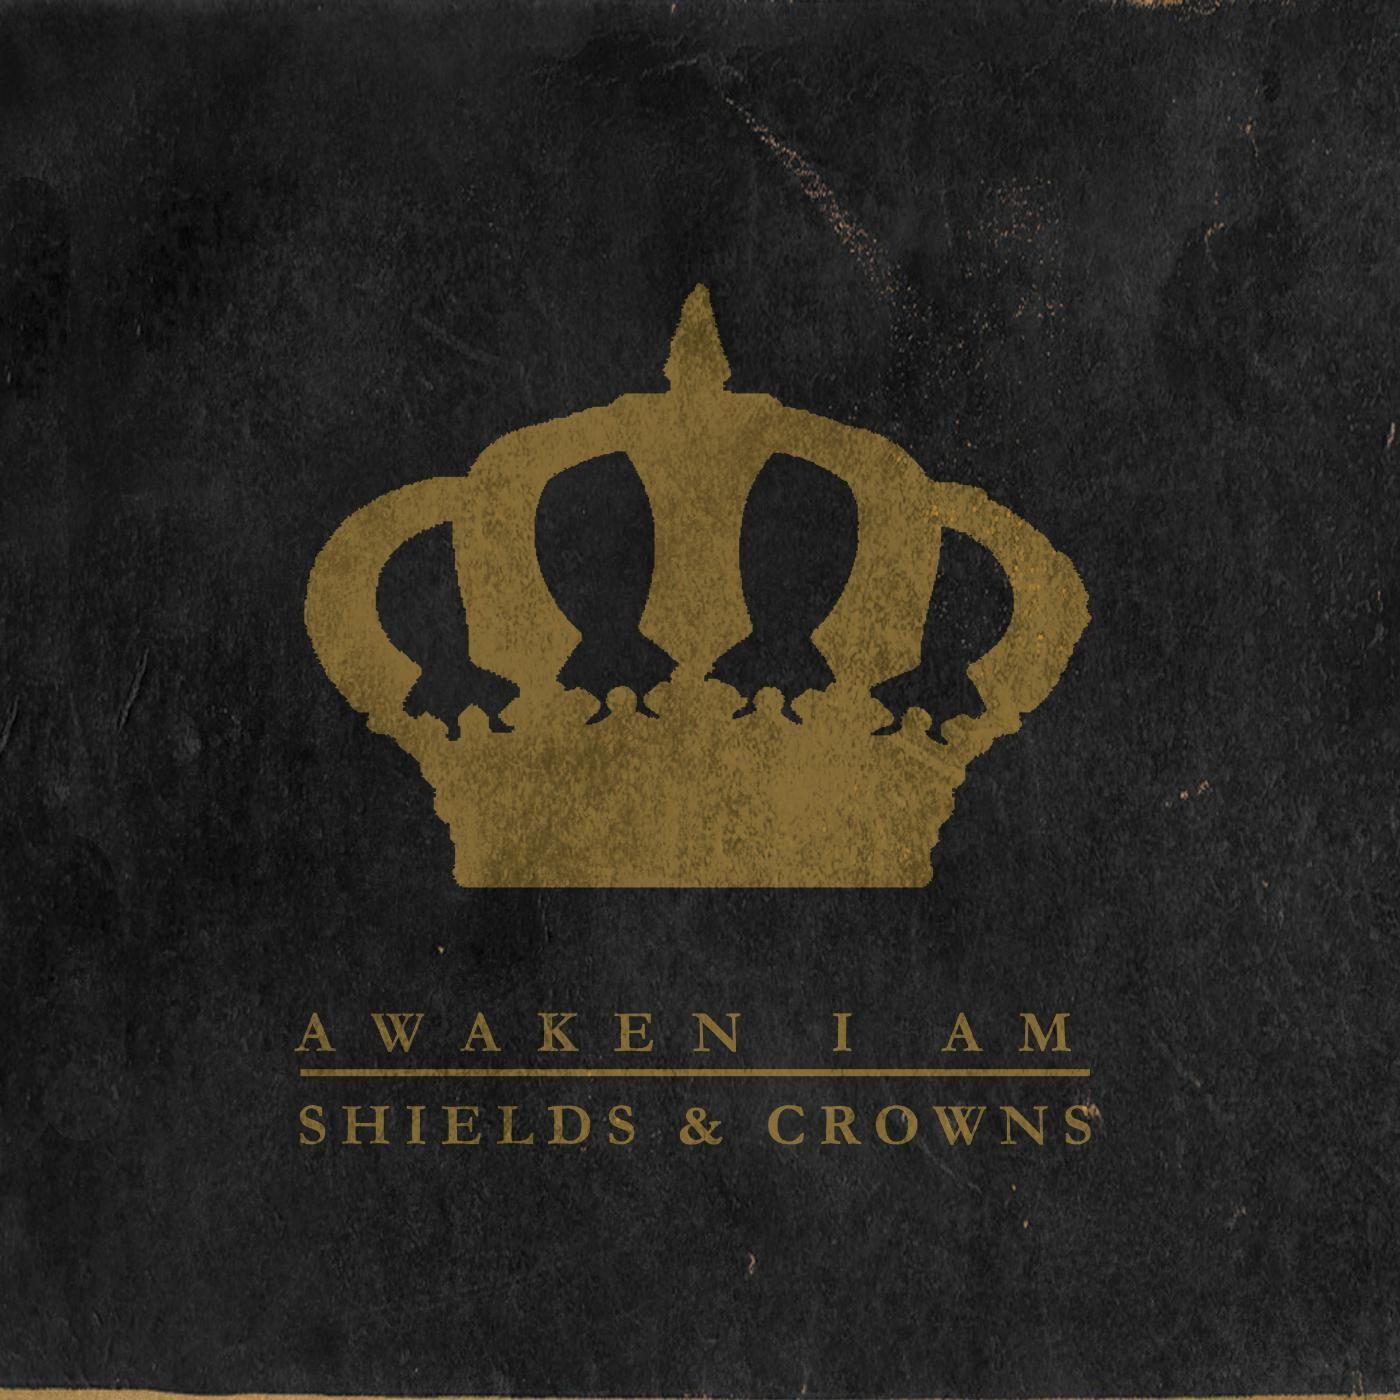 Awaken I Am - Shields & Crowns (2015)